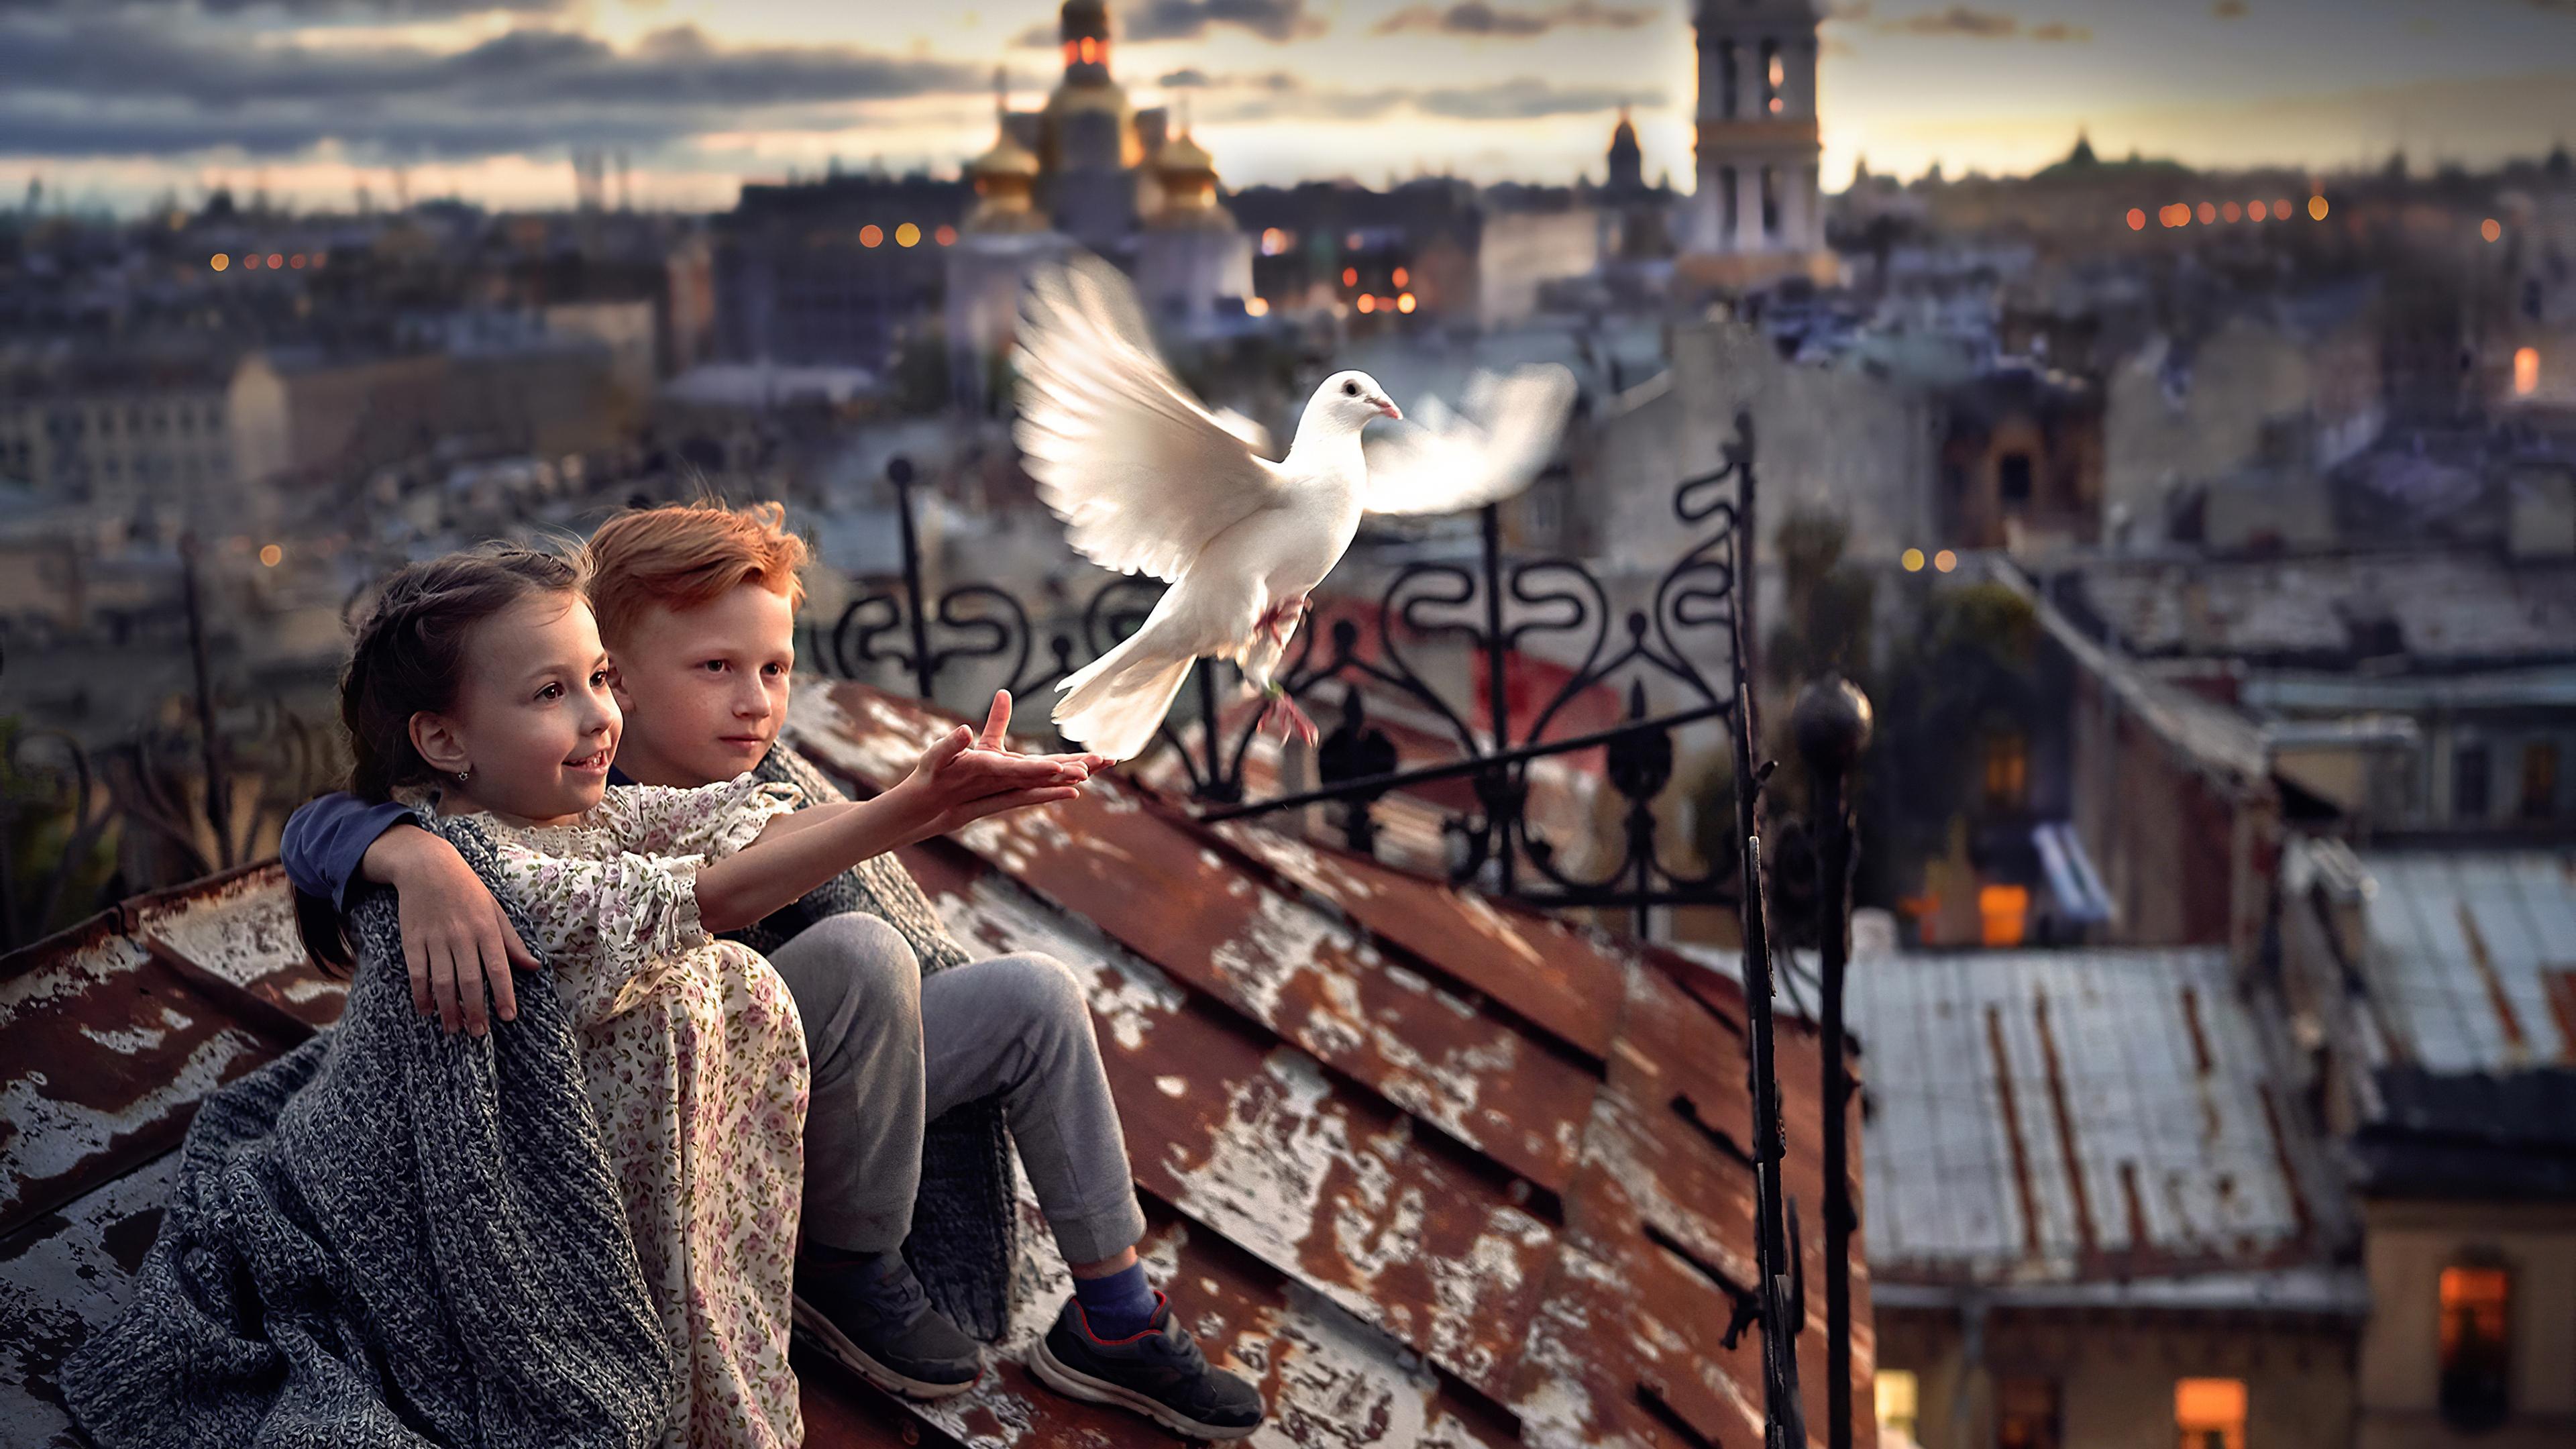 3840x2160 Little Boy And Girl Pigeon Roof 4k 4k Hd 4k